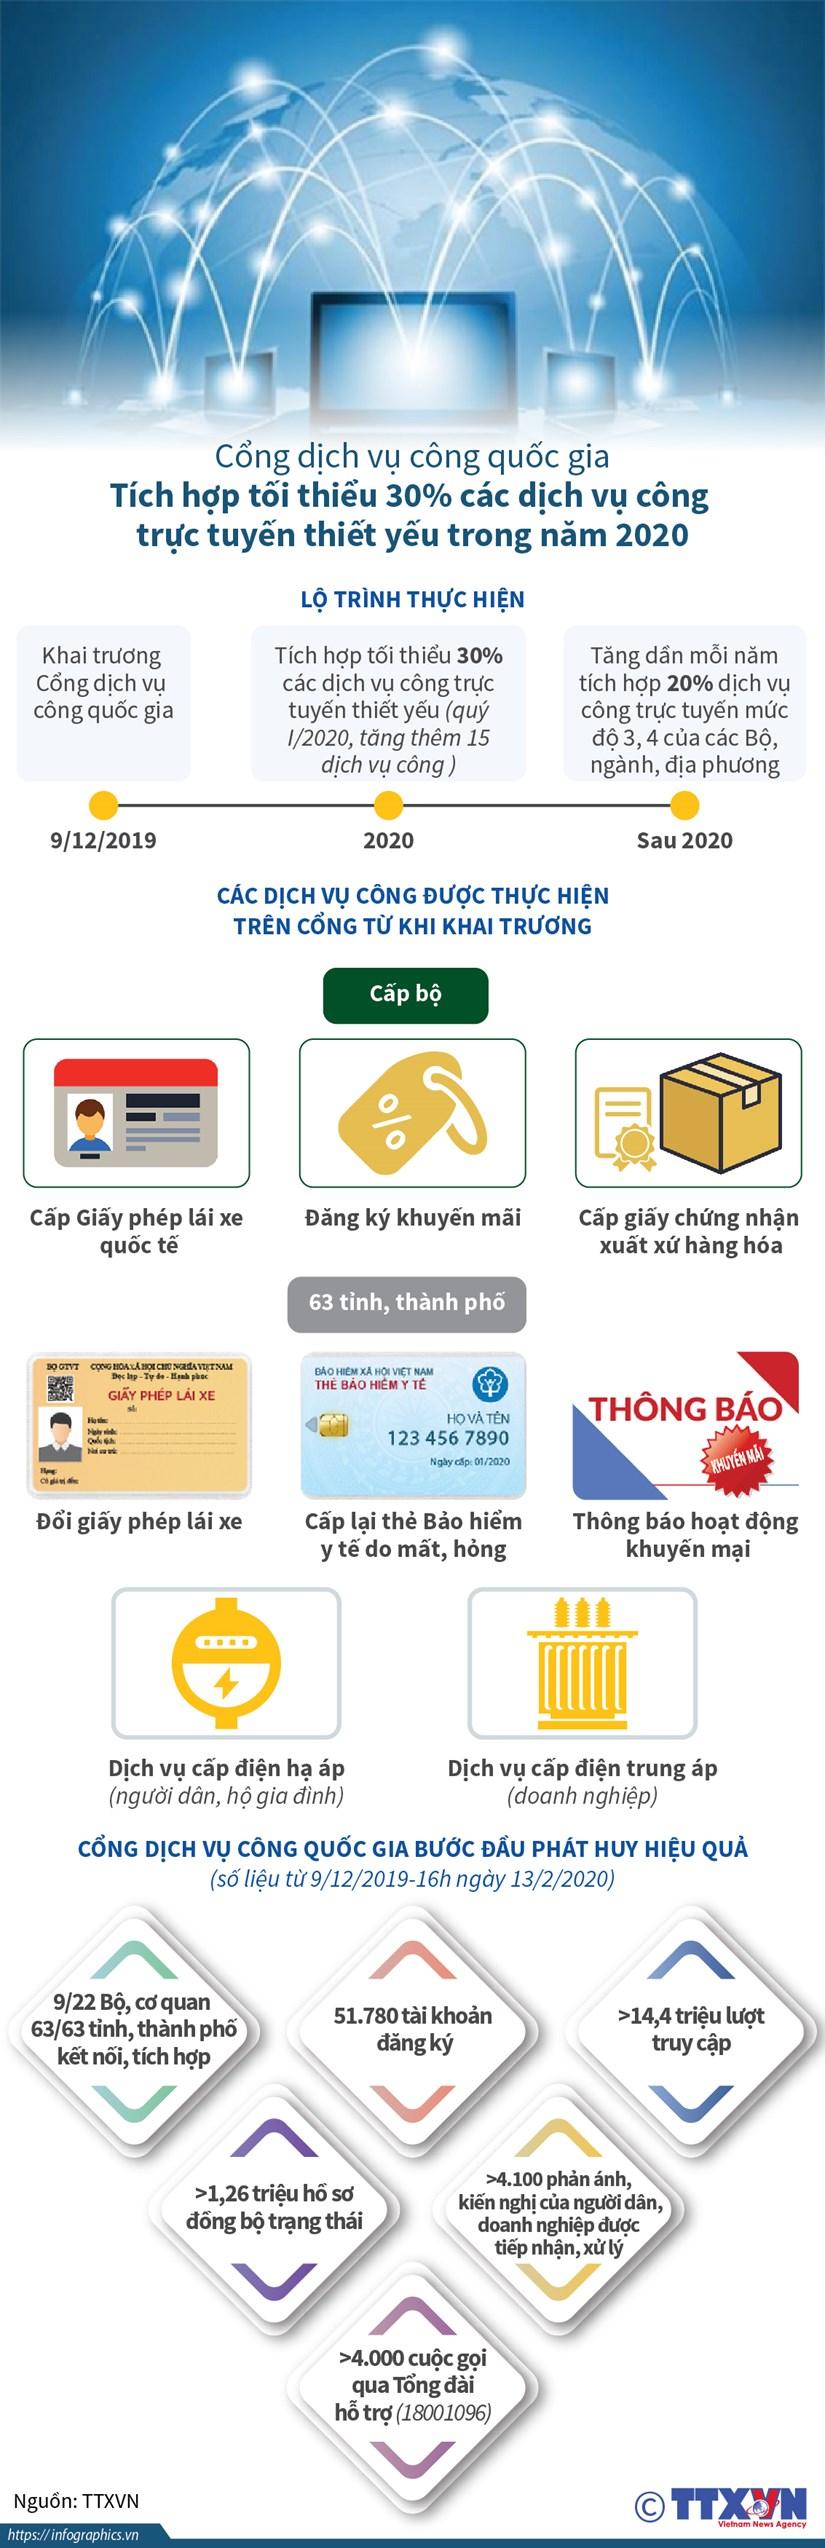 [Infographics] Cong dich vu cong quoc gia buoc dau phat huy hieu qua hinh anh 1